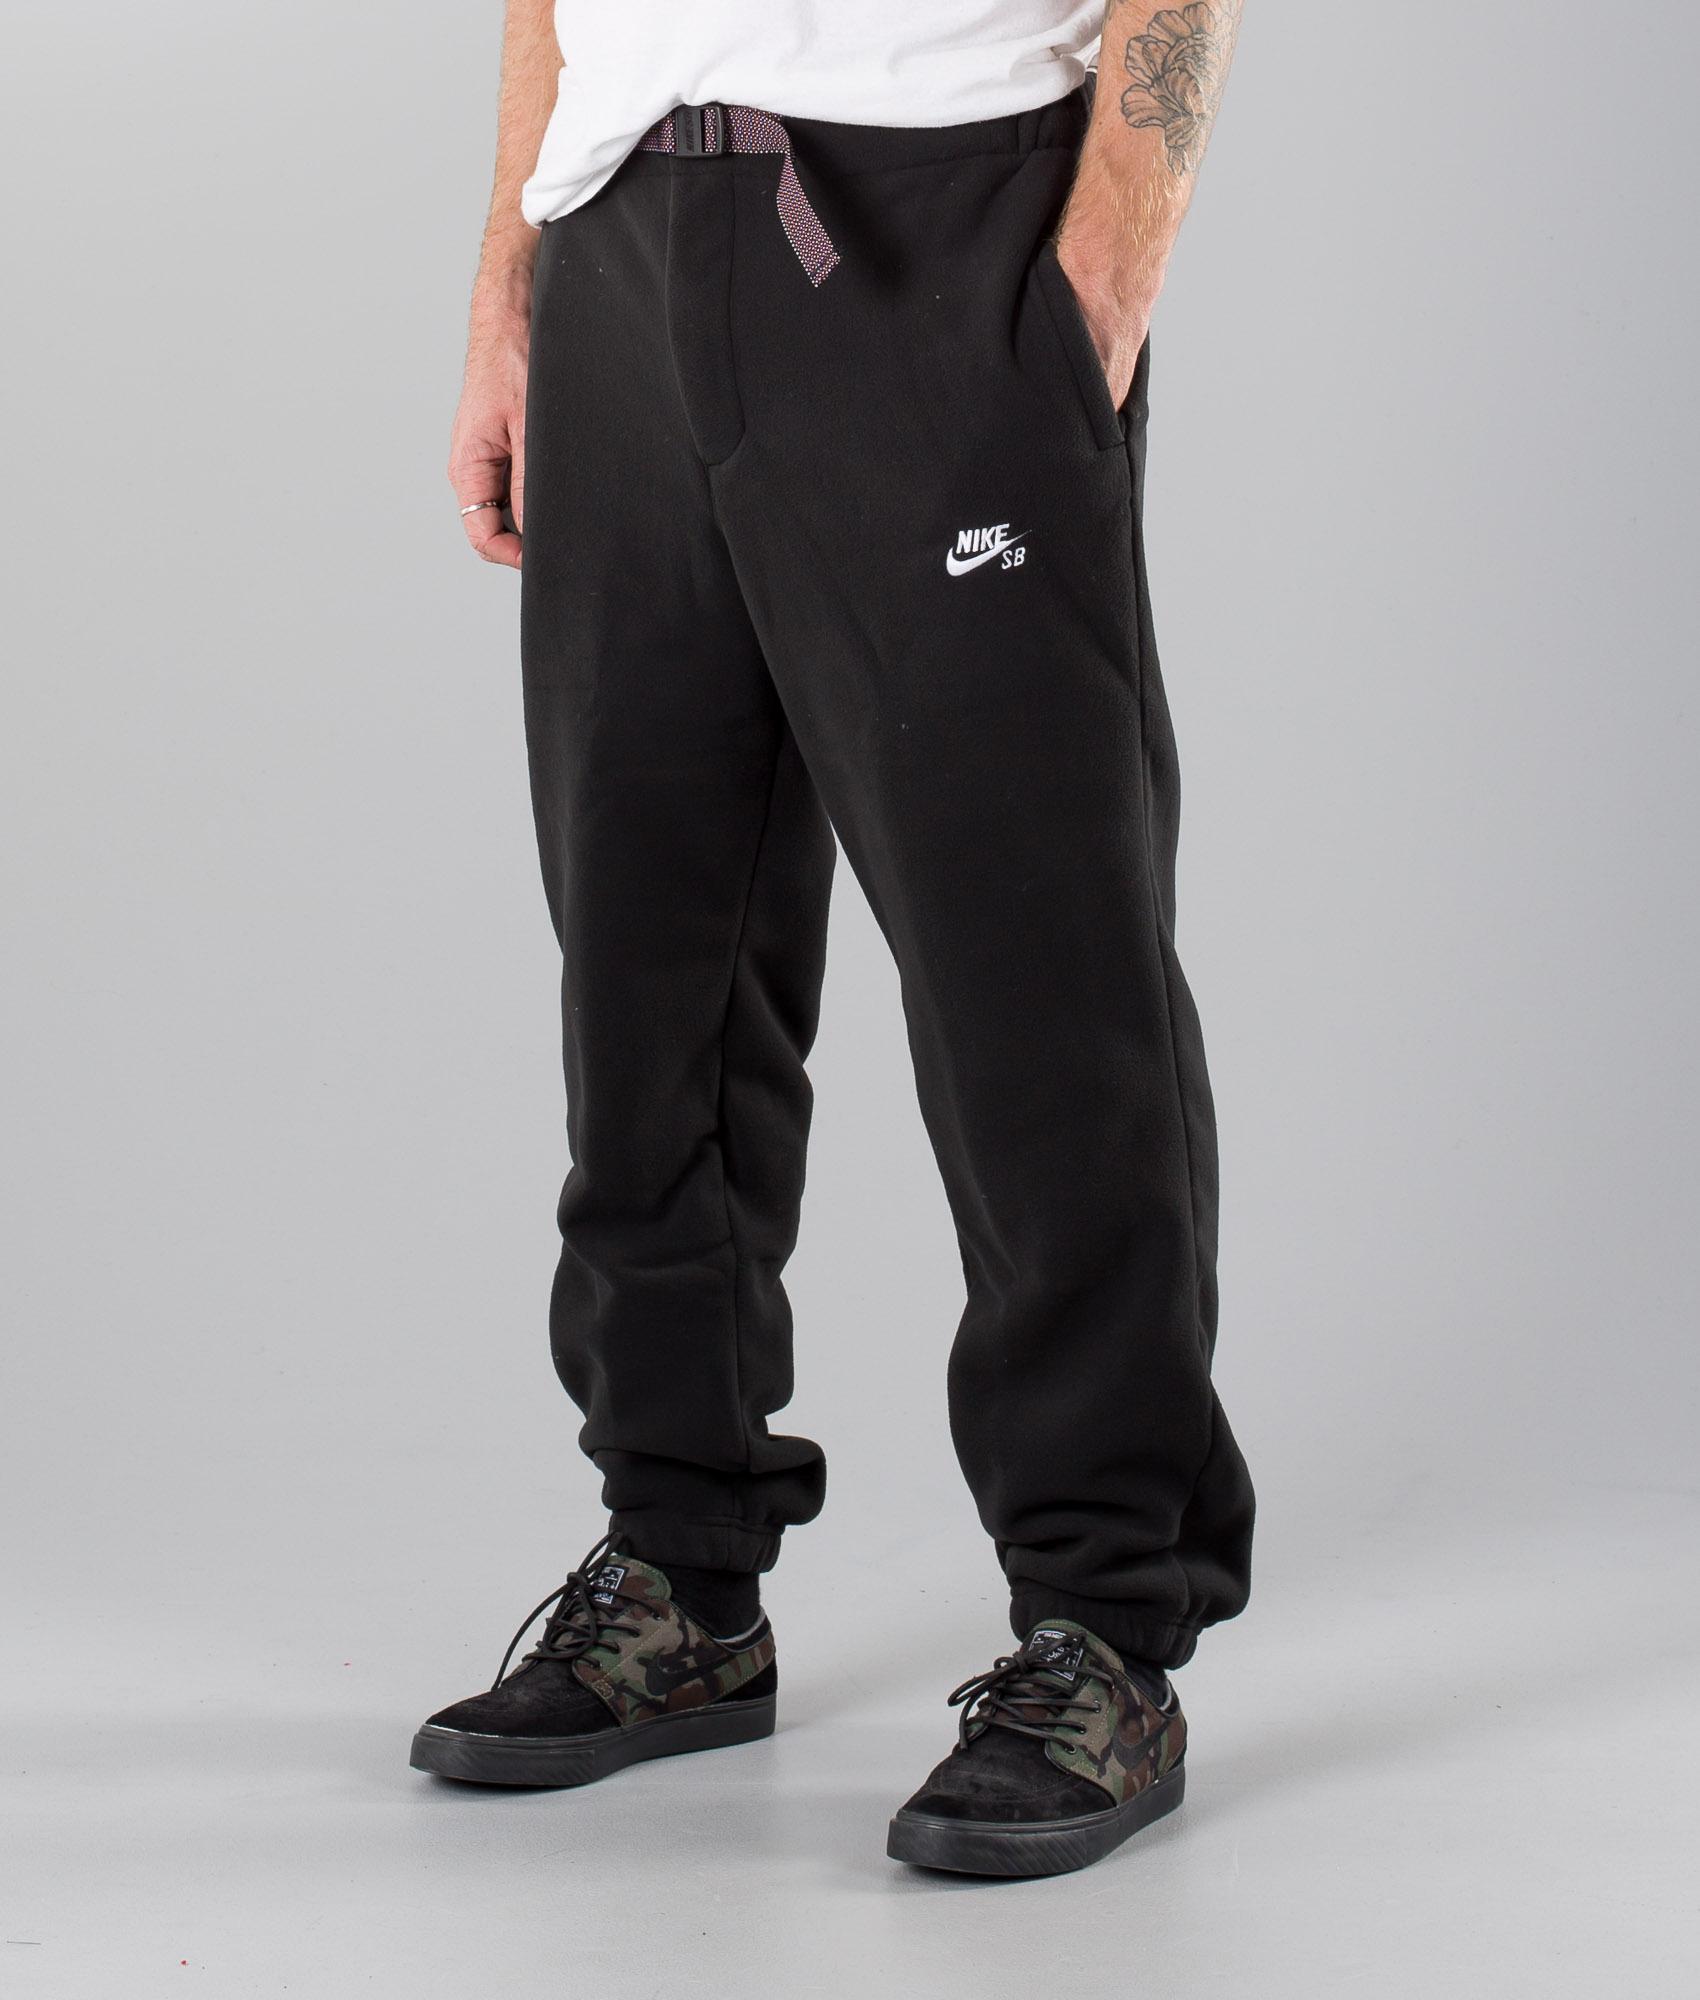 classic styles reasonably priced online retailer Nike Sb Polartec Pants Black/White